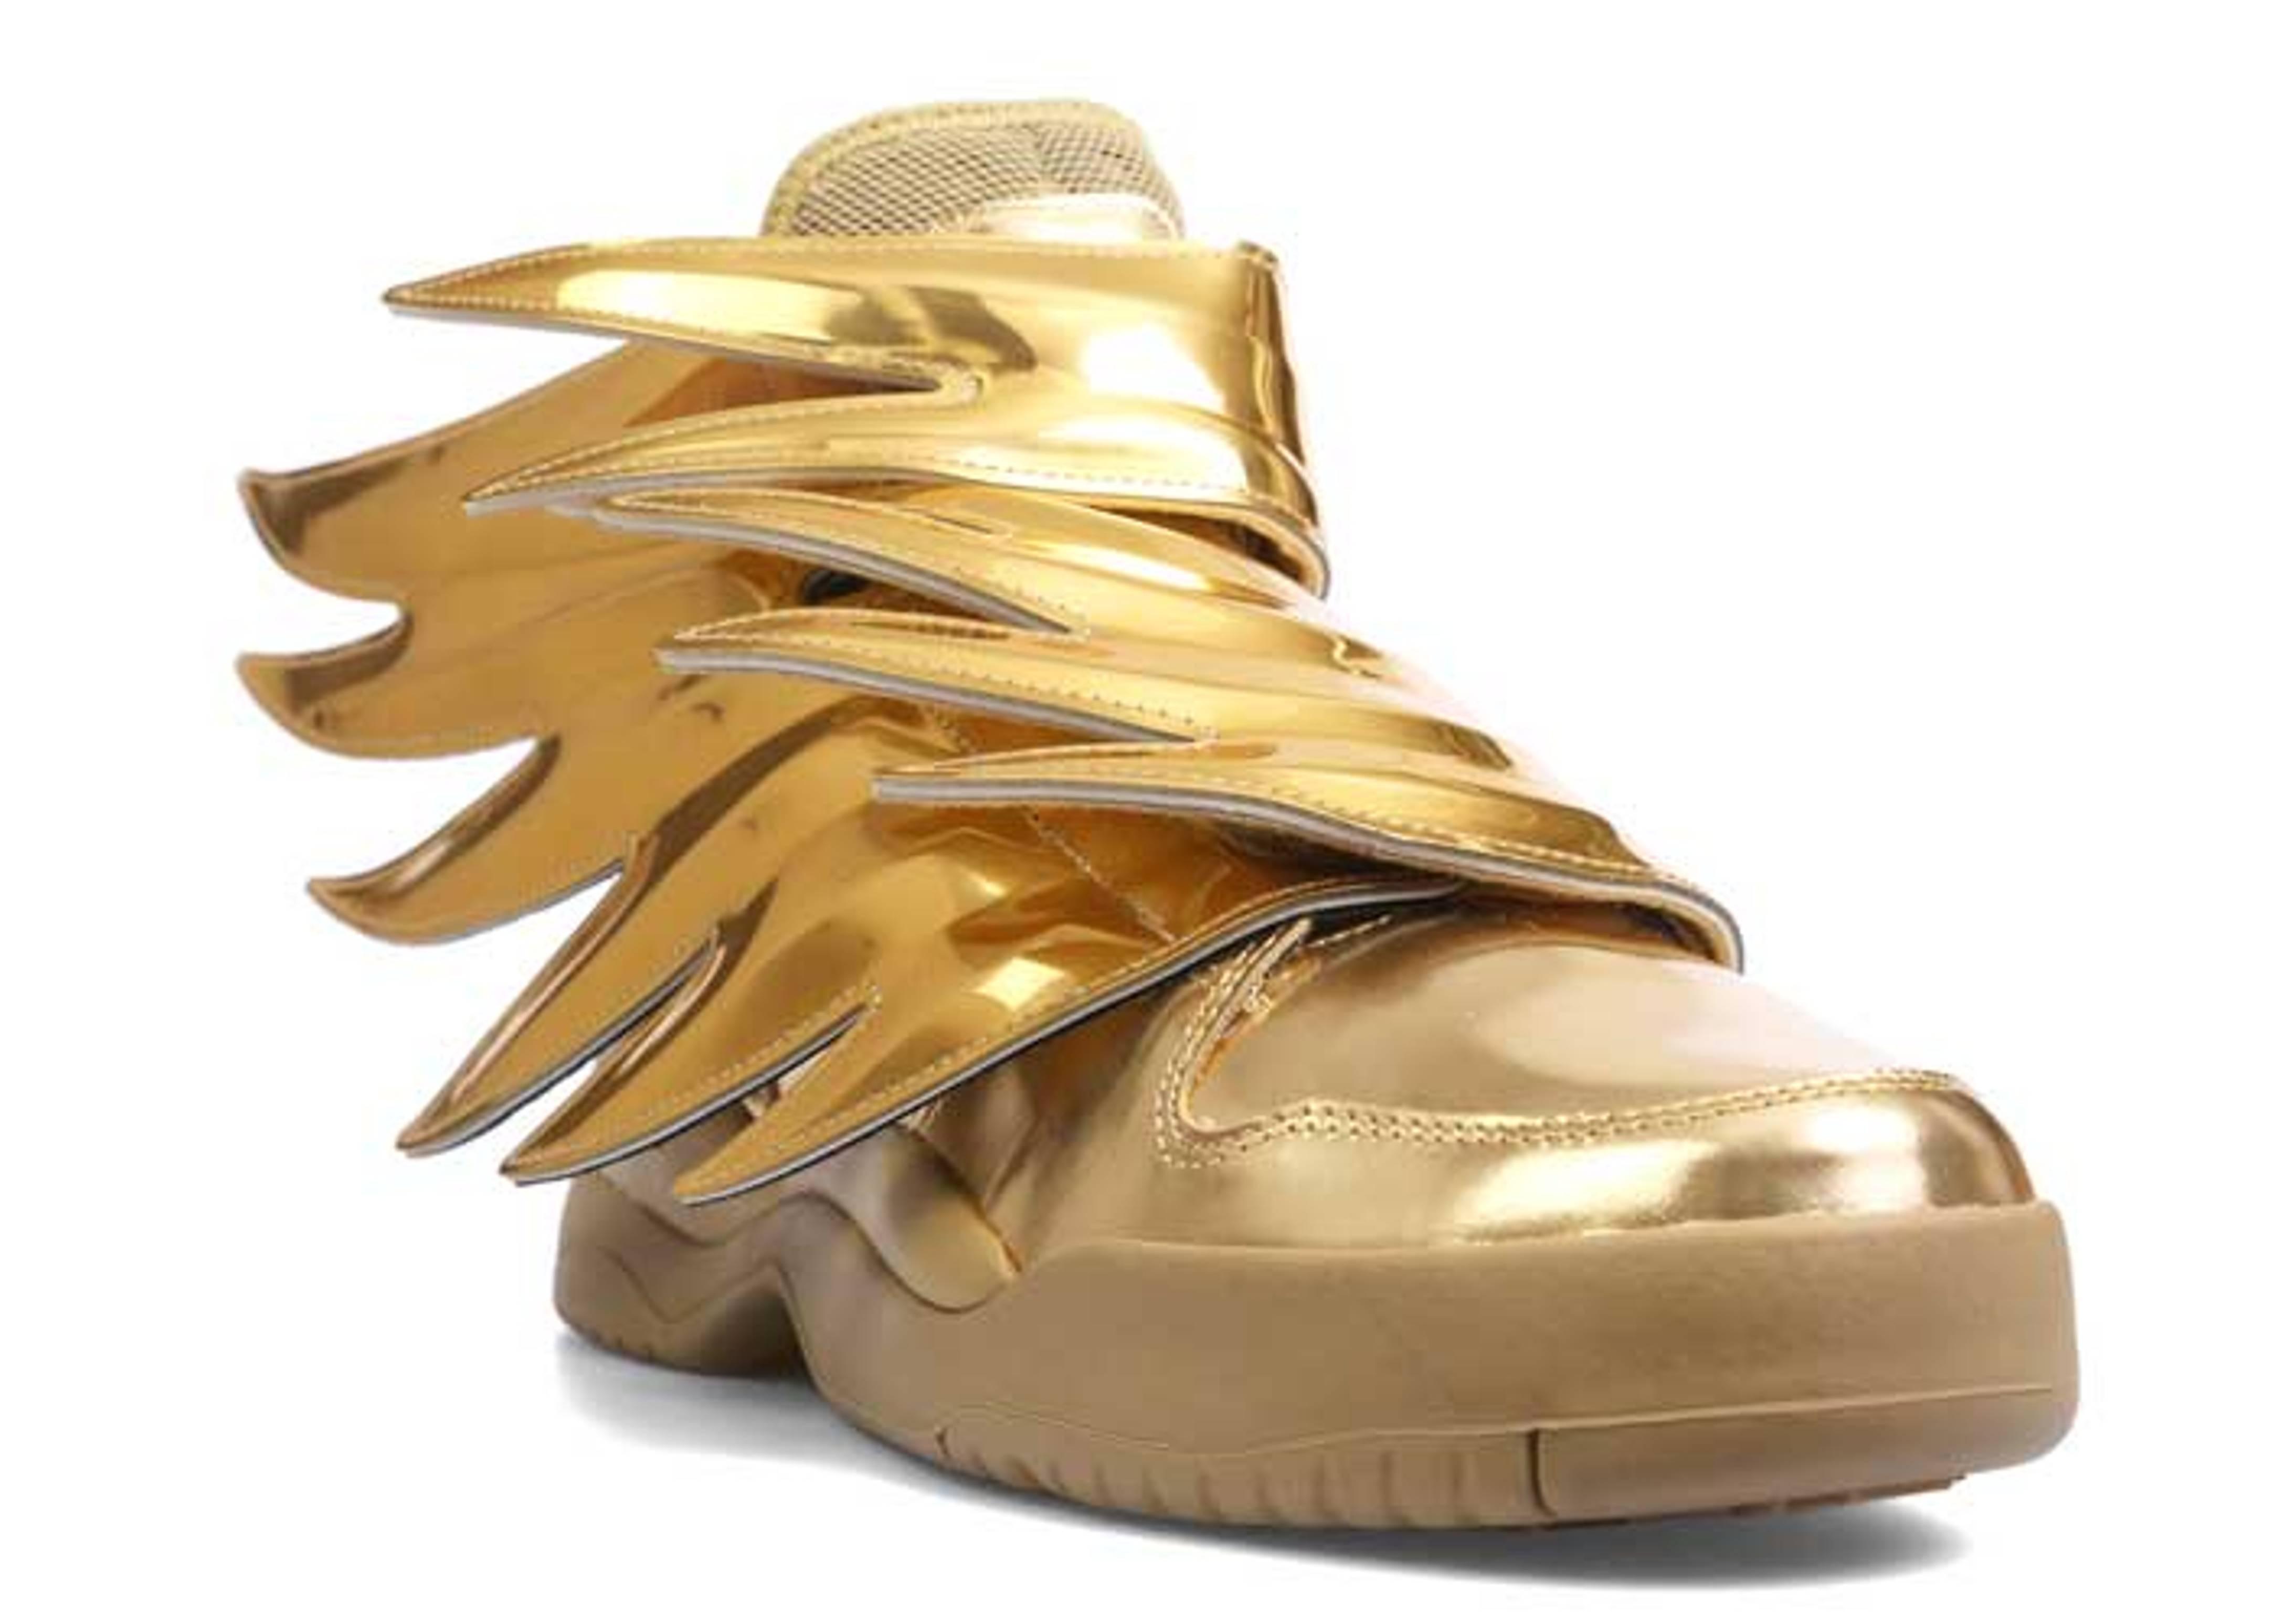 7e5f357d3e07 Buy cheap Online - adidas js wings gold